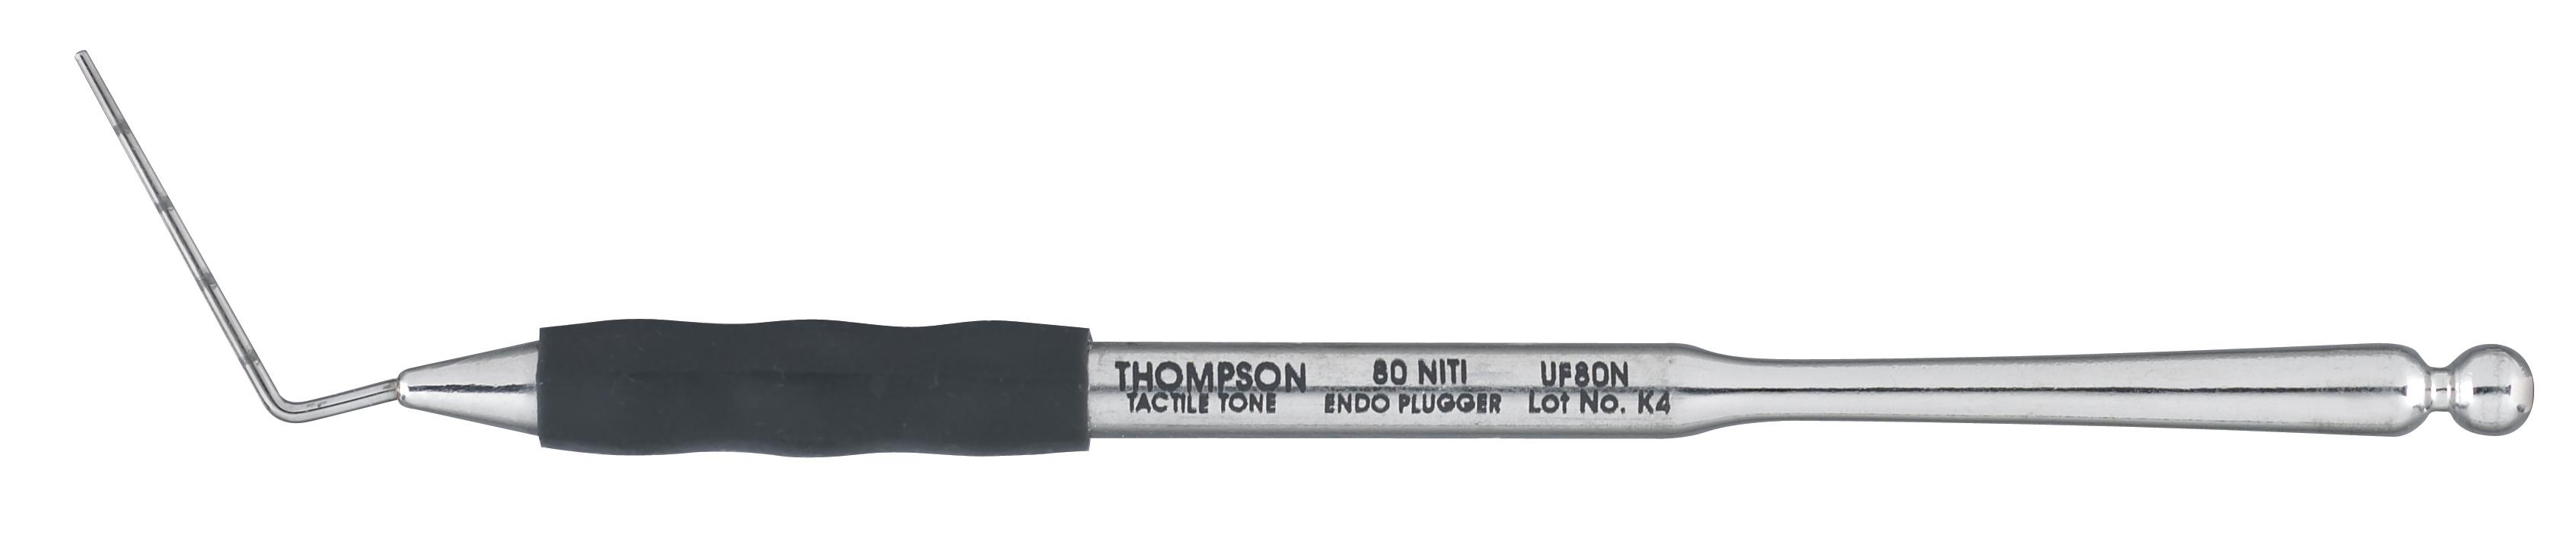 endo-plugger-80-tactile-tone-single-end-niti-black-uf80n-miltex.jpg